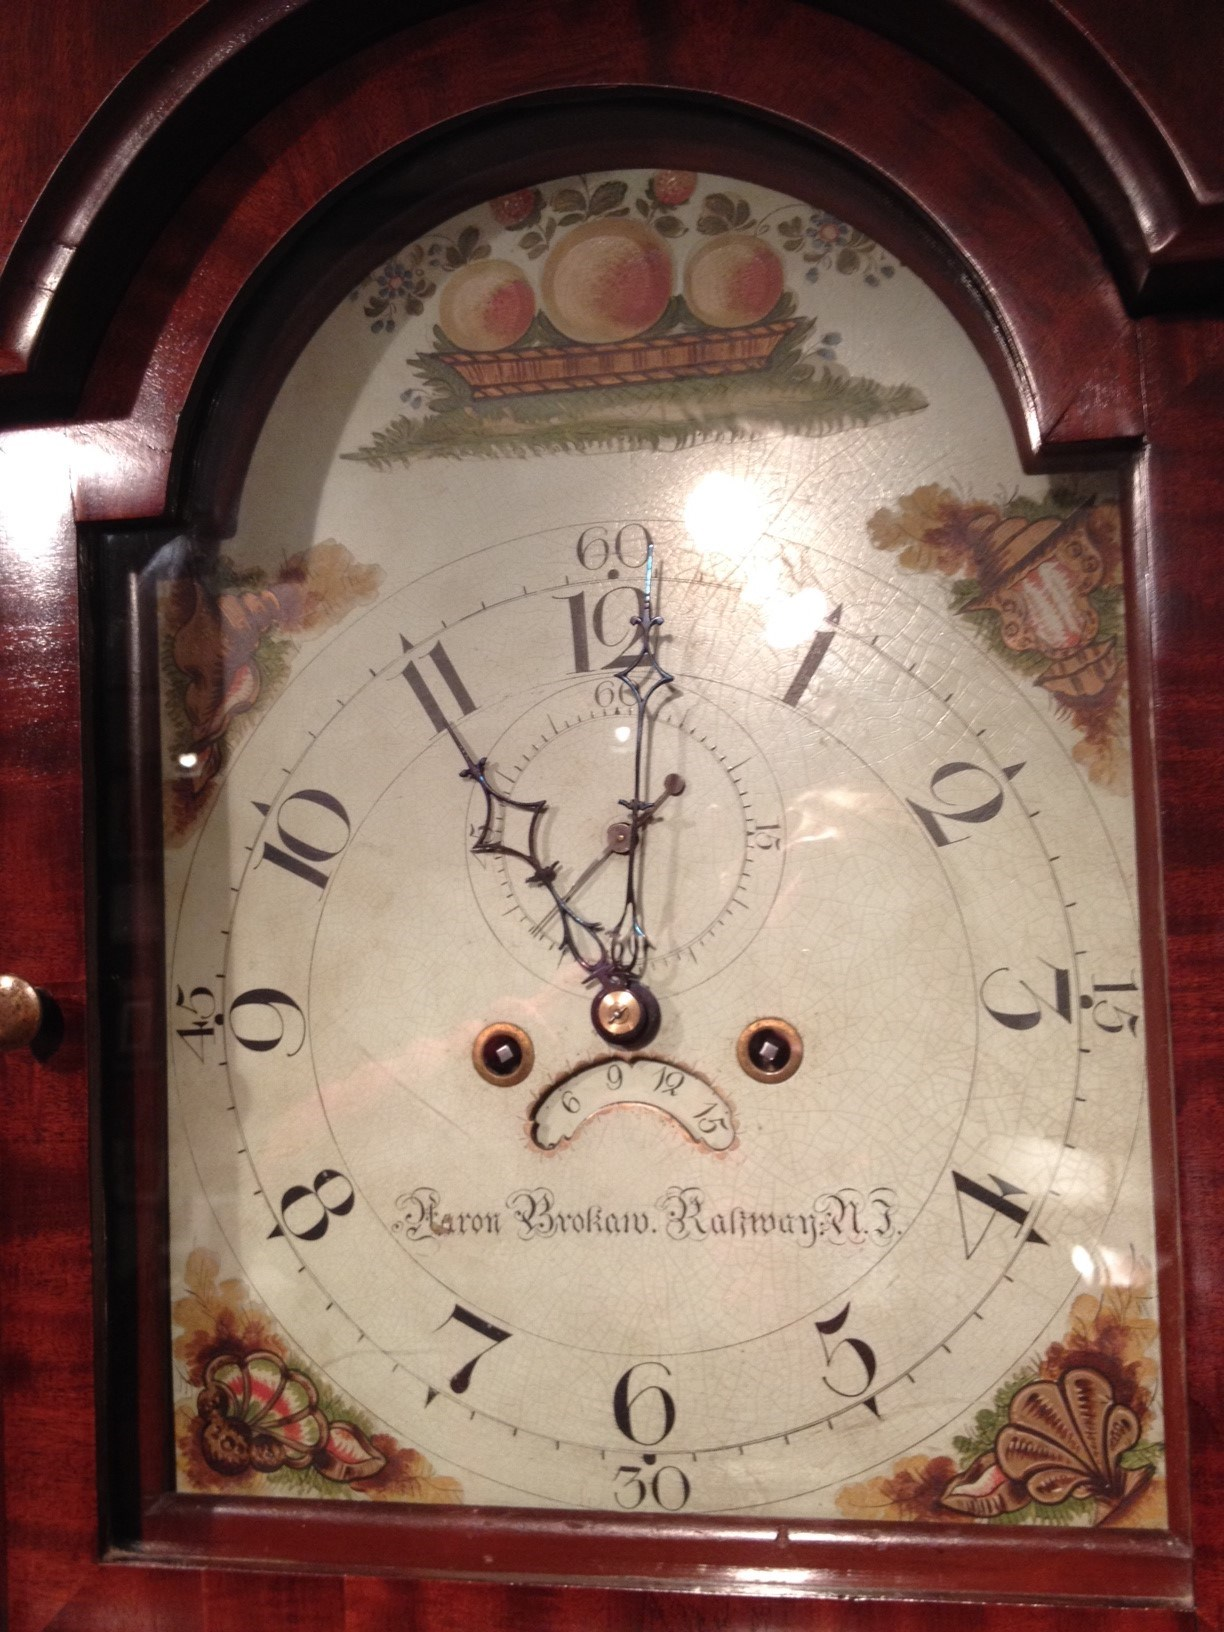 Detail of Painted Dial on Longcase Clock by Aaron Brokaw. Raffety Ltd